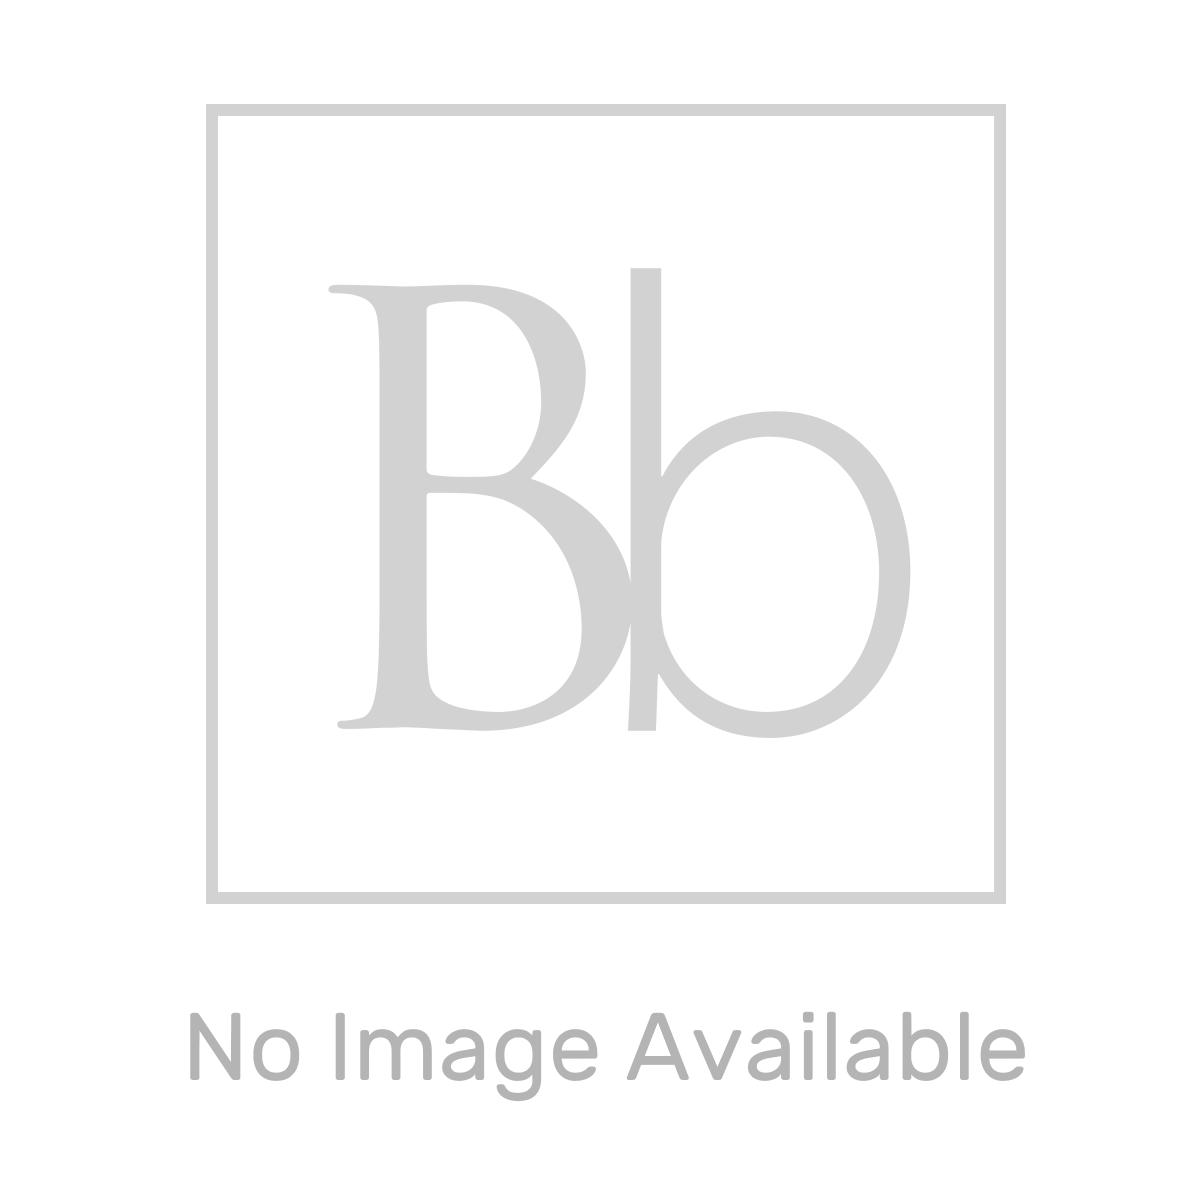 RAK Rimless Technology